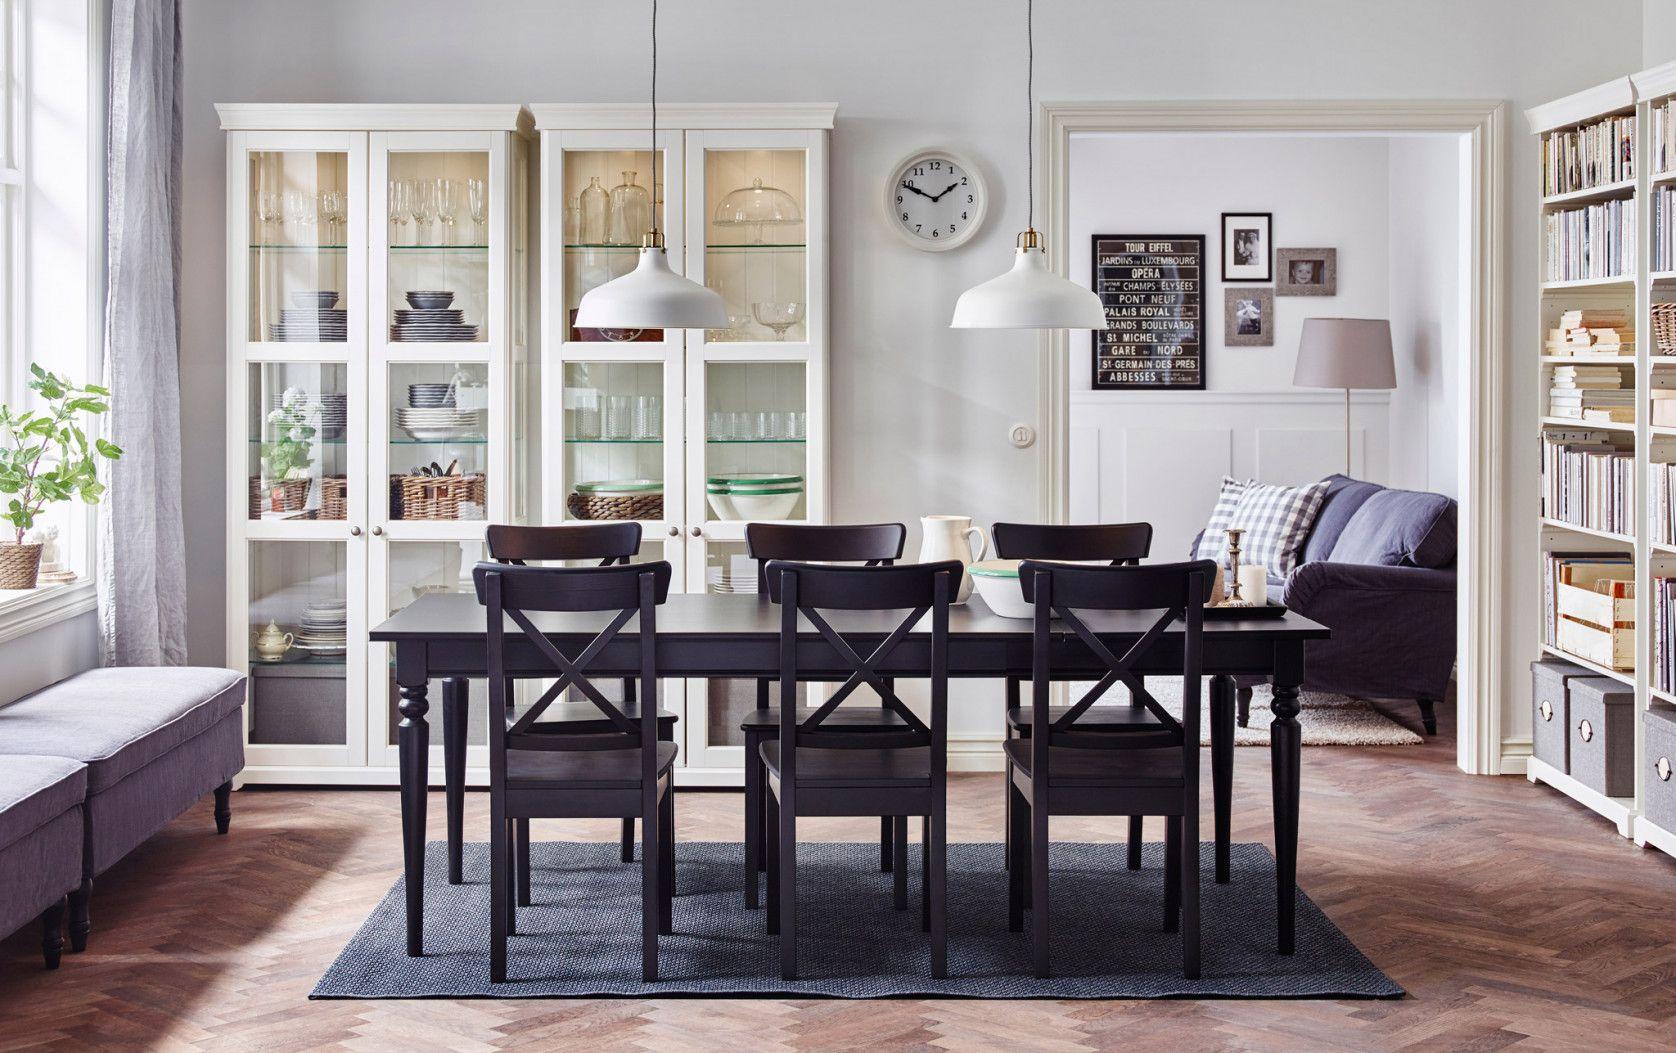 77 Black Dining Room Cabinet